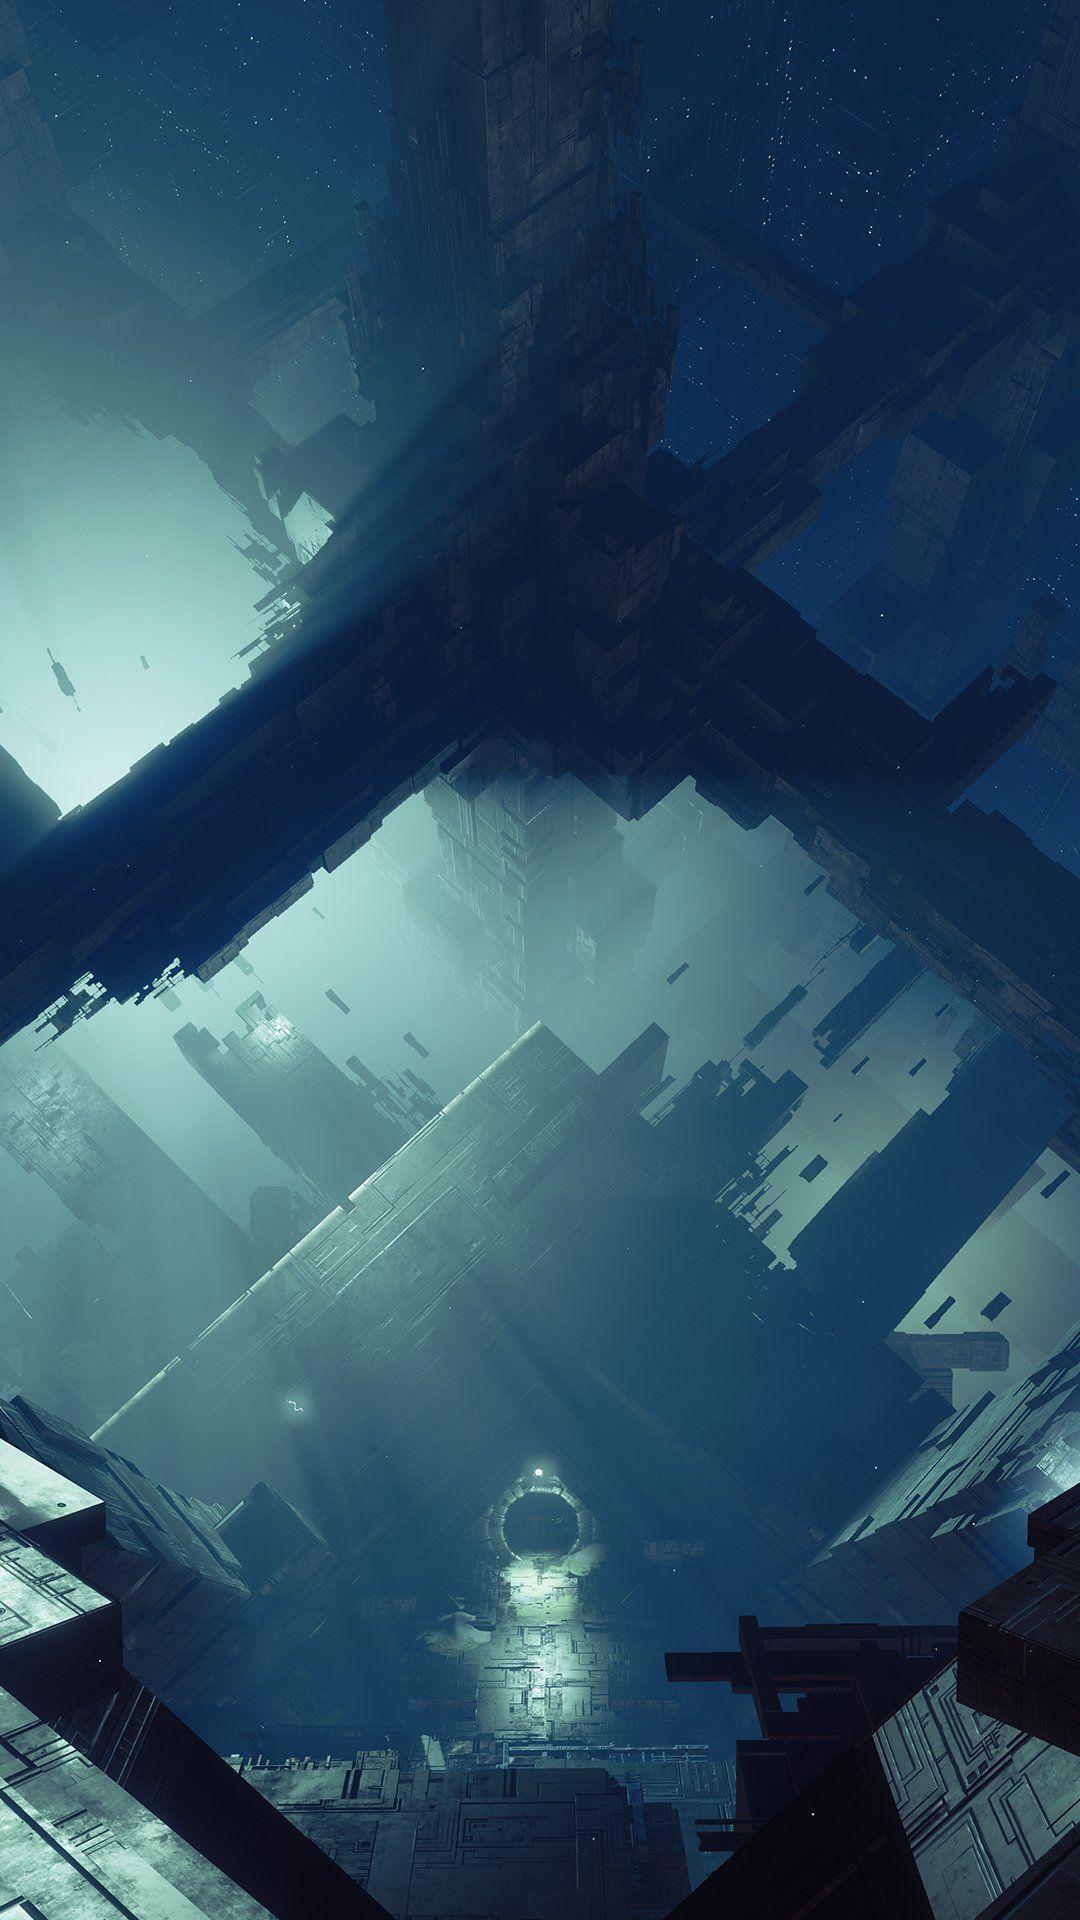 4k Destiny Warlock Wallpaper In Destiny Backgrounds Landscape Concept Destiny Warlock